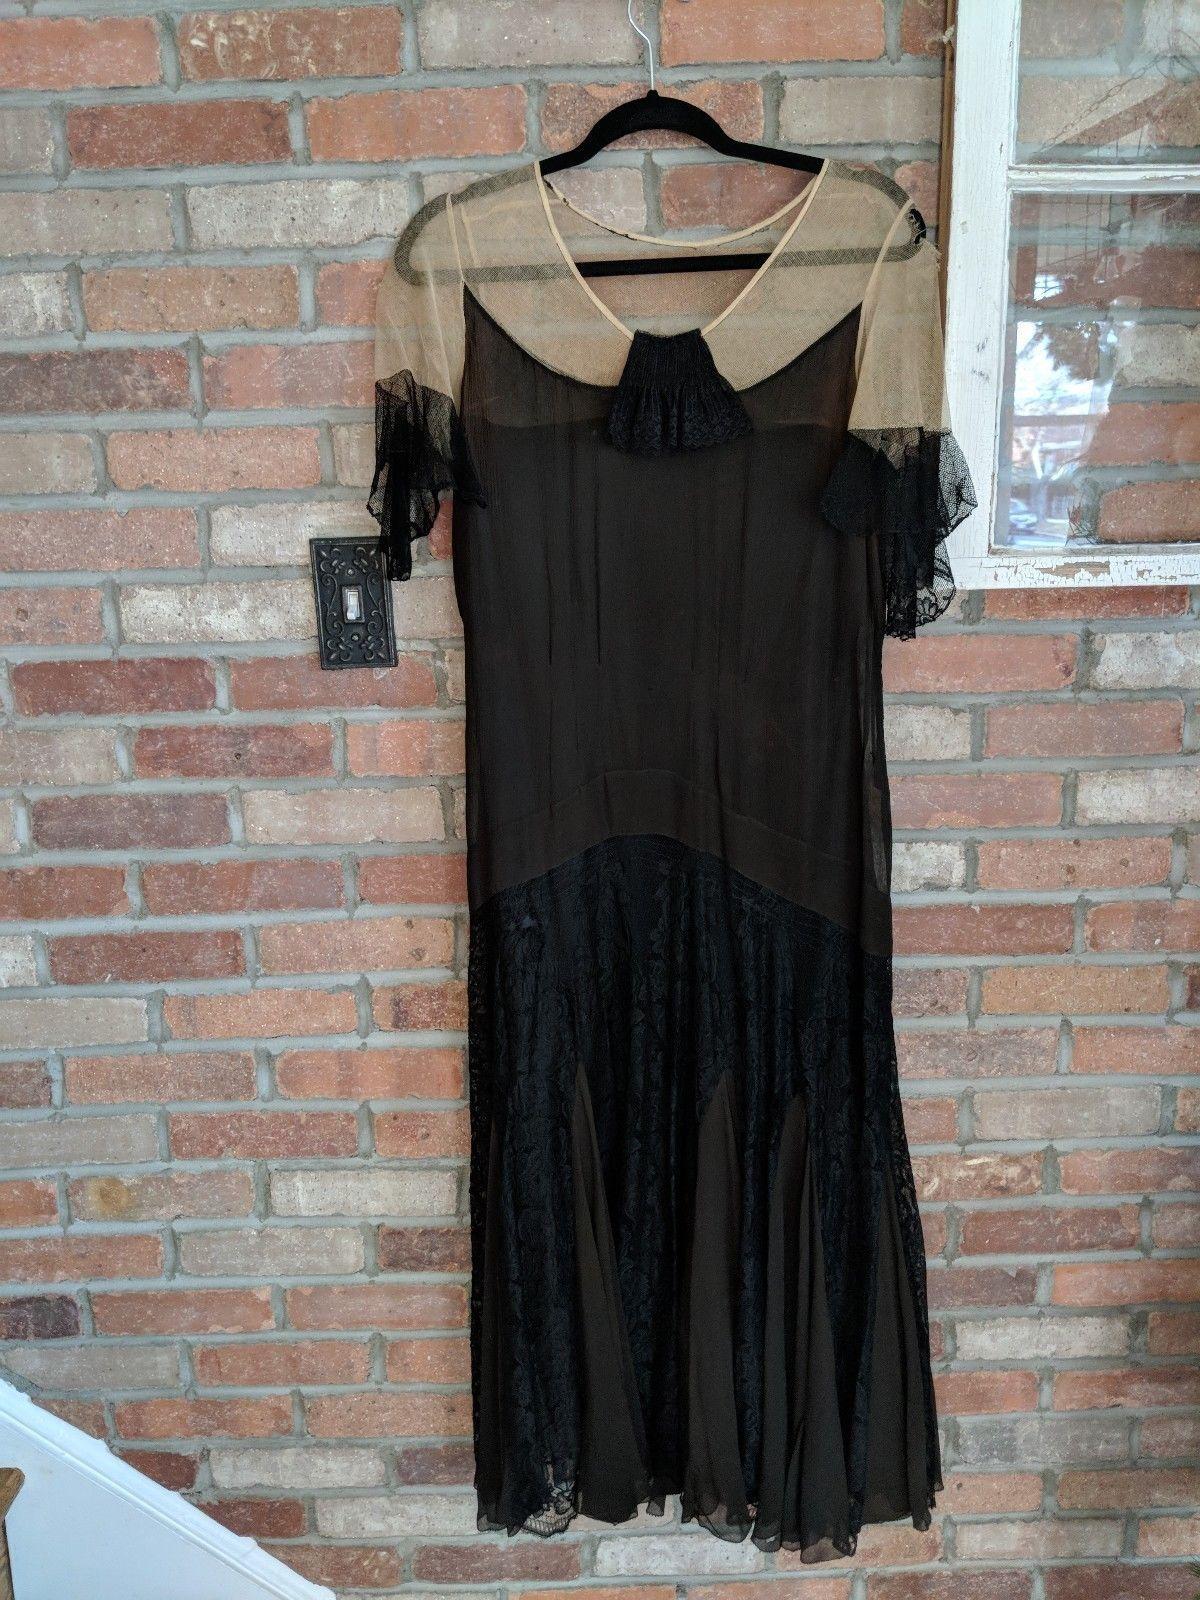 True vintage us drop waist dress crepe and lace ml black